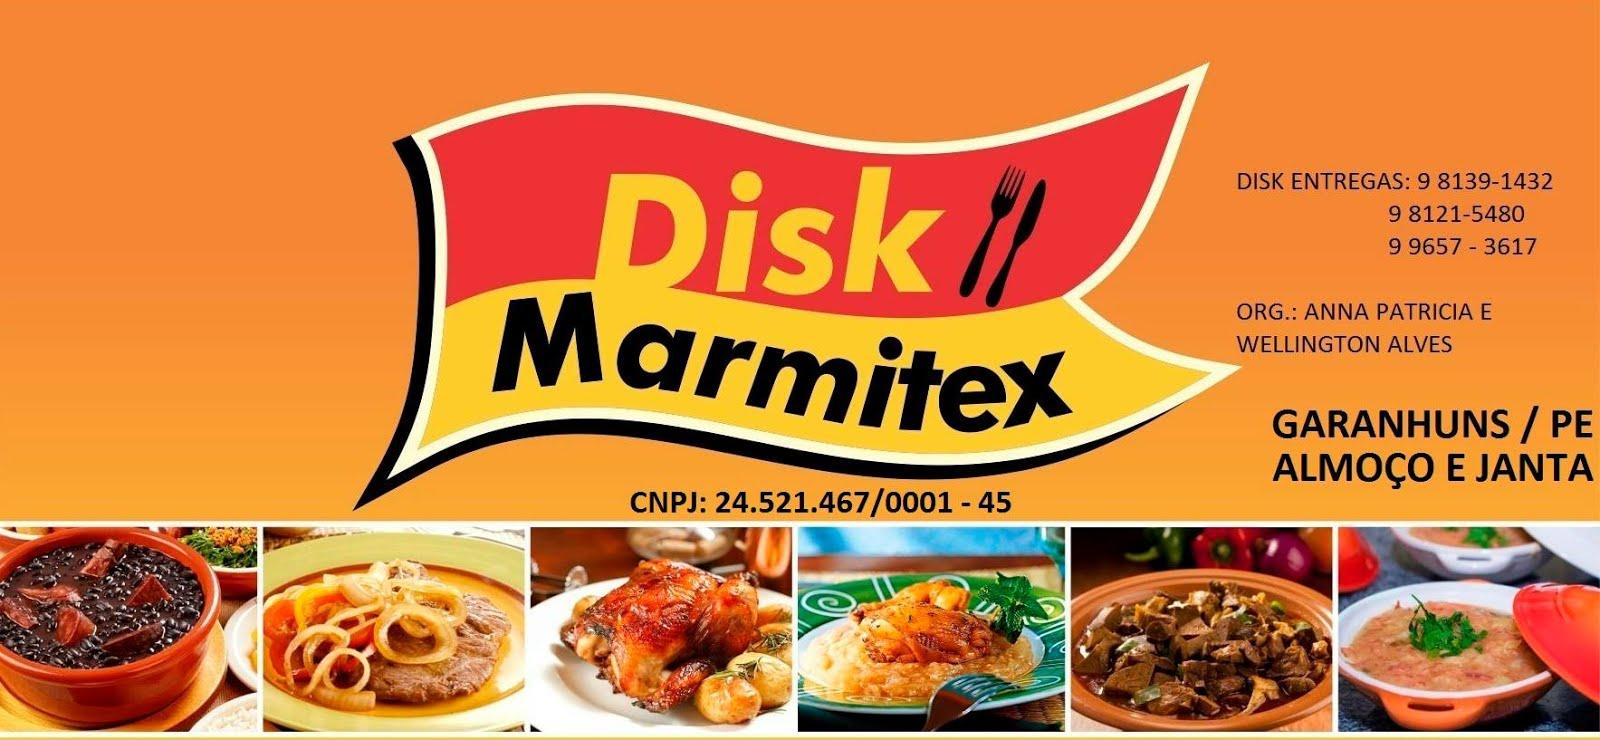 Disk Marmitex Garanhuns/PE